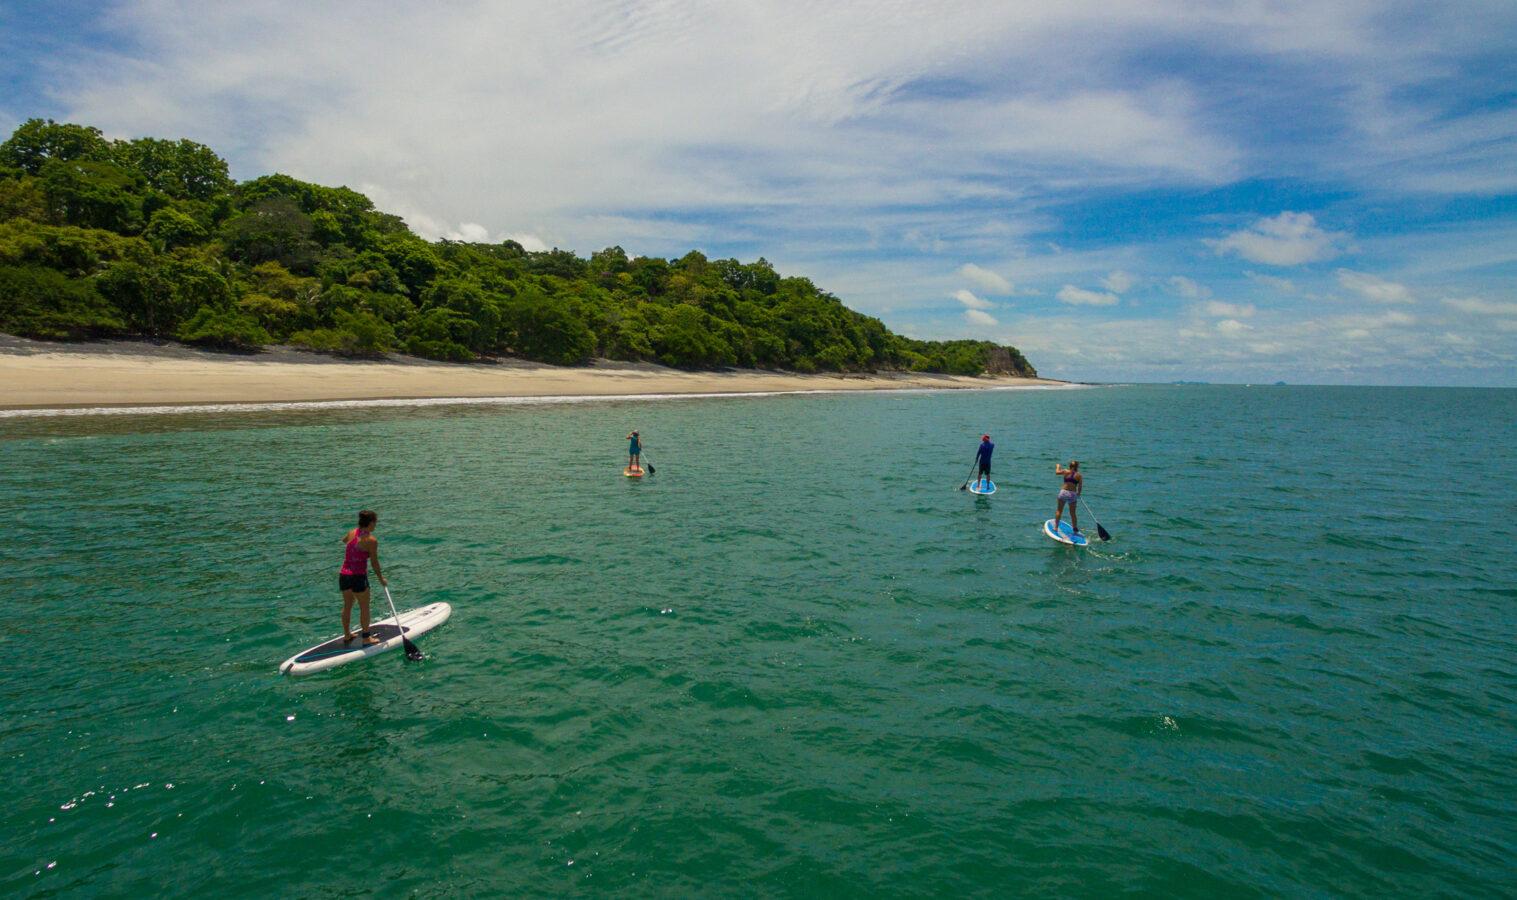 Stand-up-paddle-boarding vacation at the beautiful Playa Grande Beach.